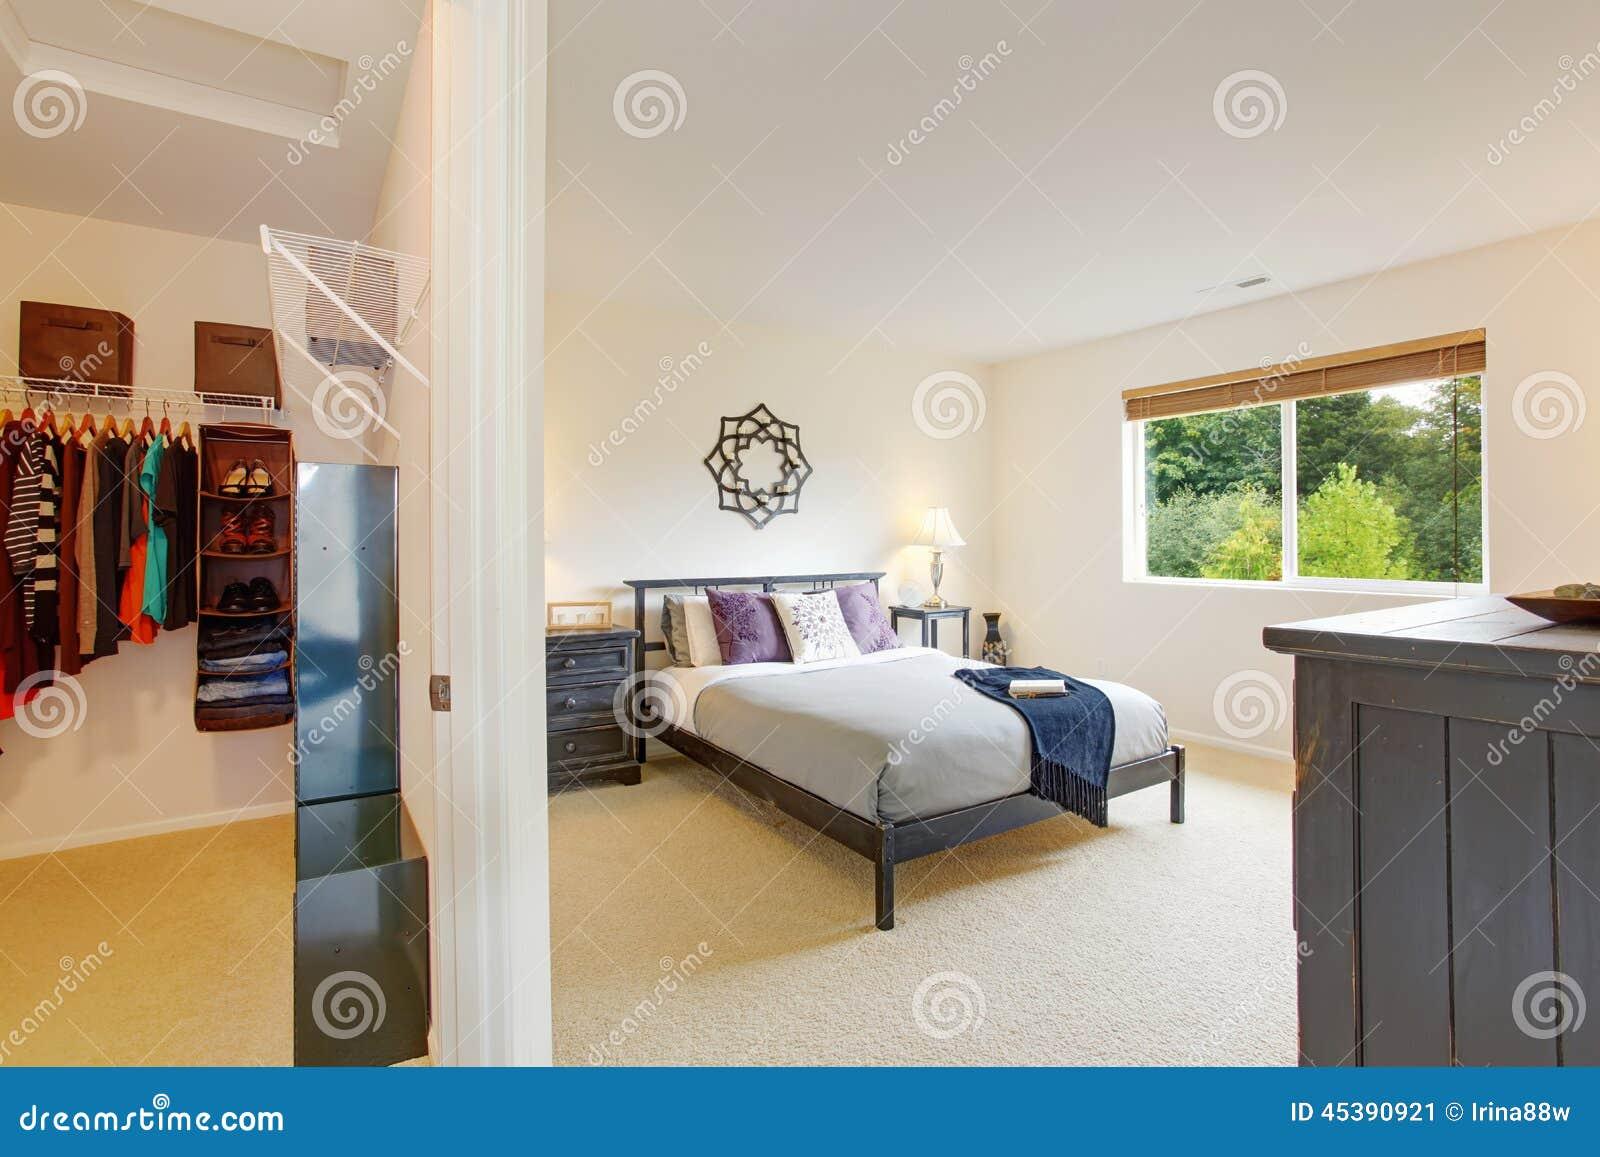 Int rieur de chambre coucher principale avec la penderie for Chambre walk in